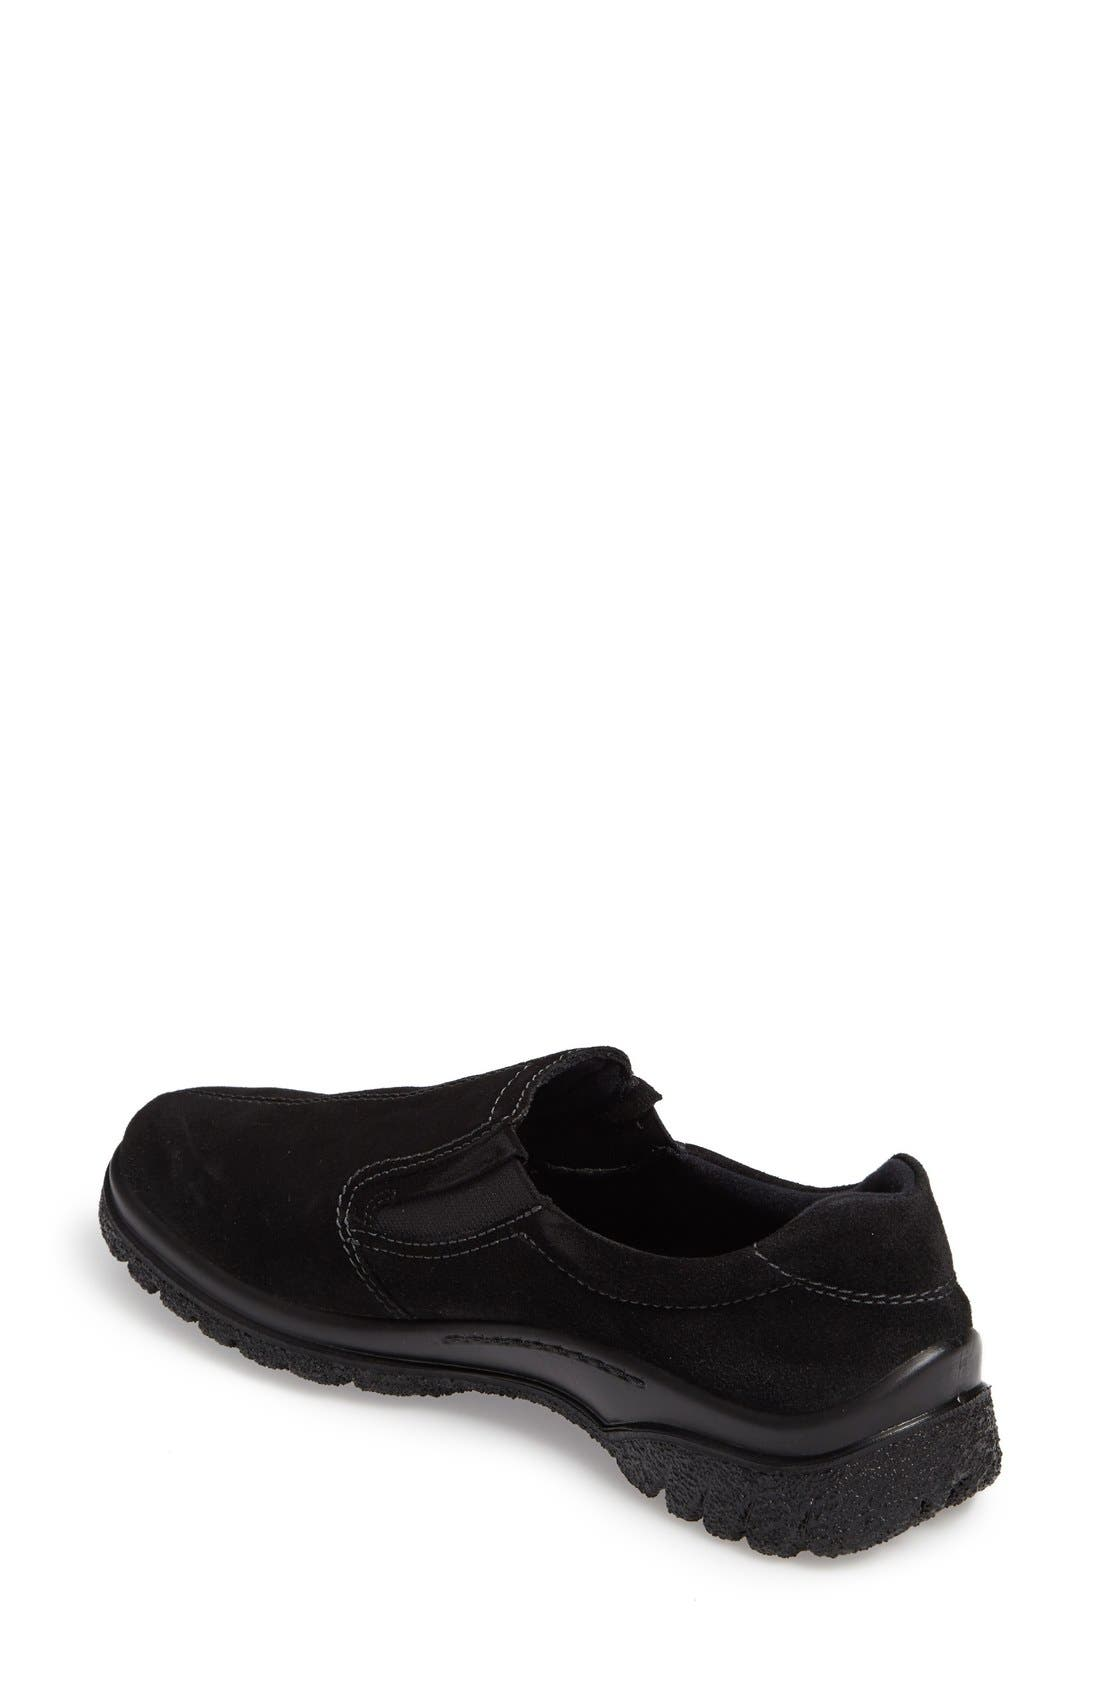 Alternate Image 2  - ara Parson Waterproof Gore-Tex® Slip-On Sneaker (Women)